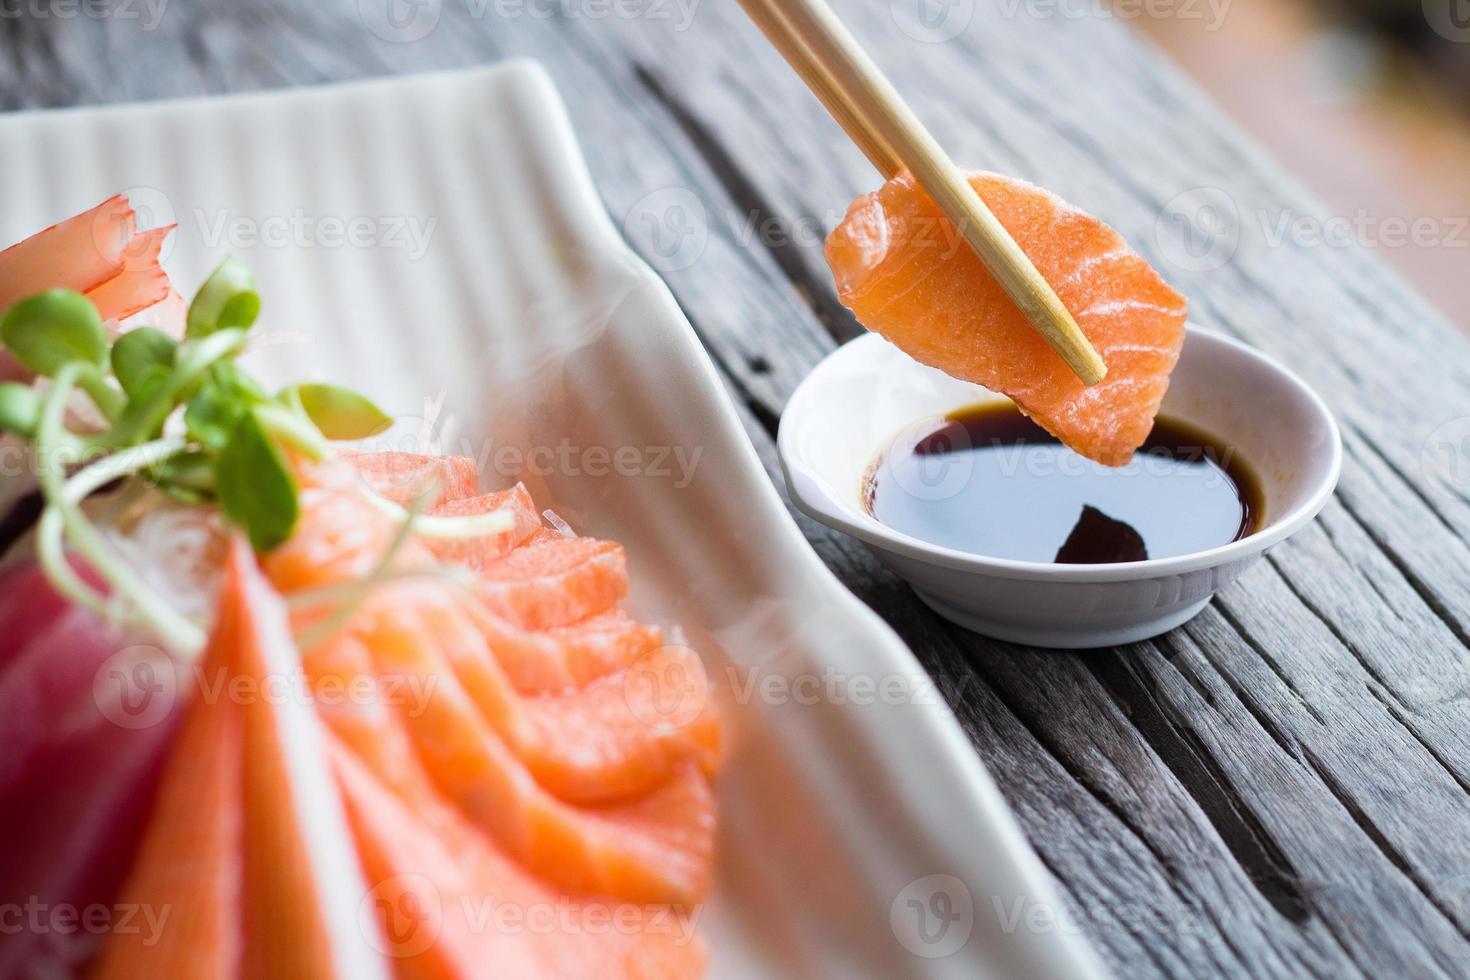 sashimi de salmón con palillos foto